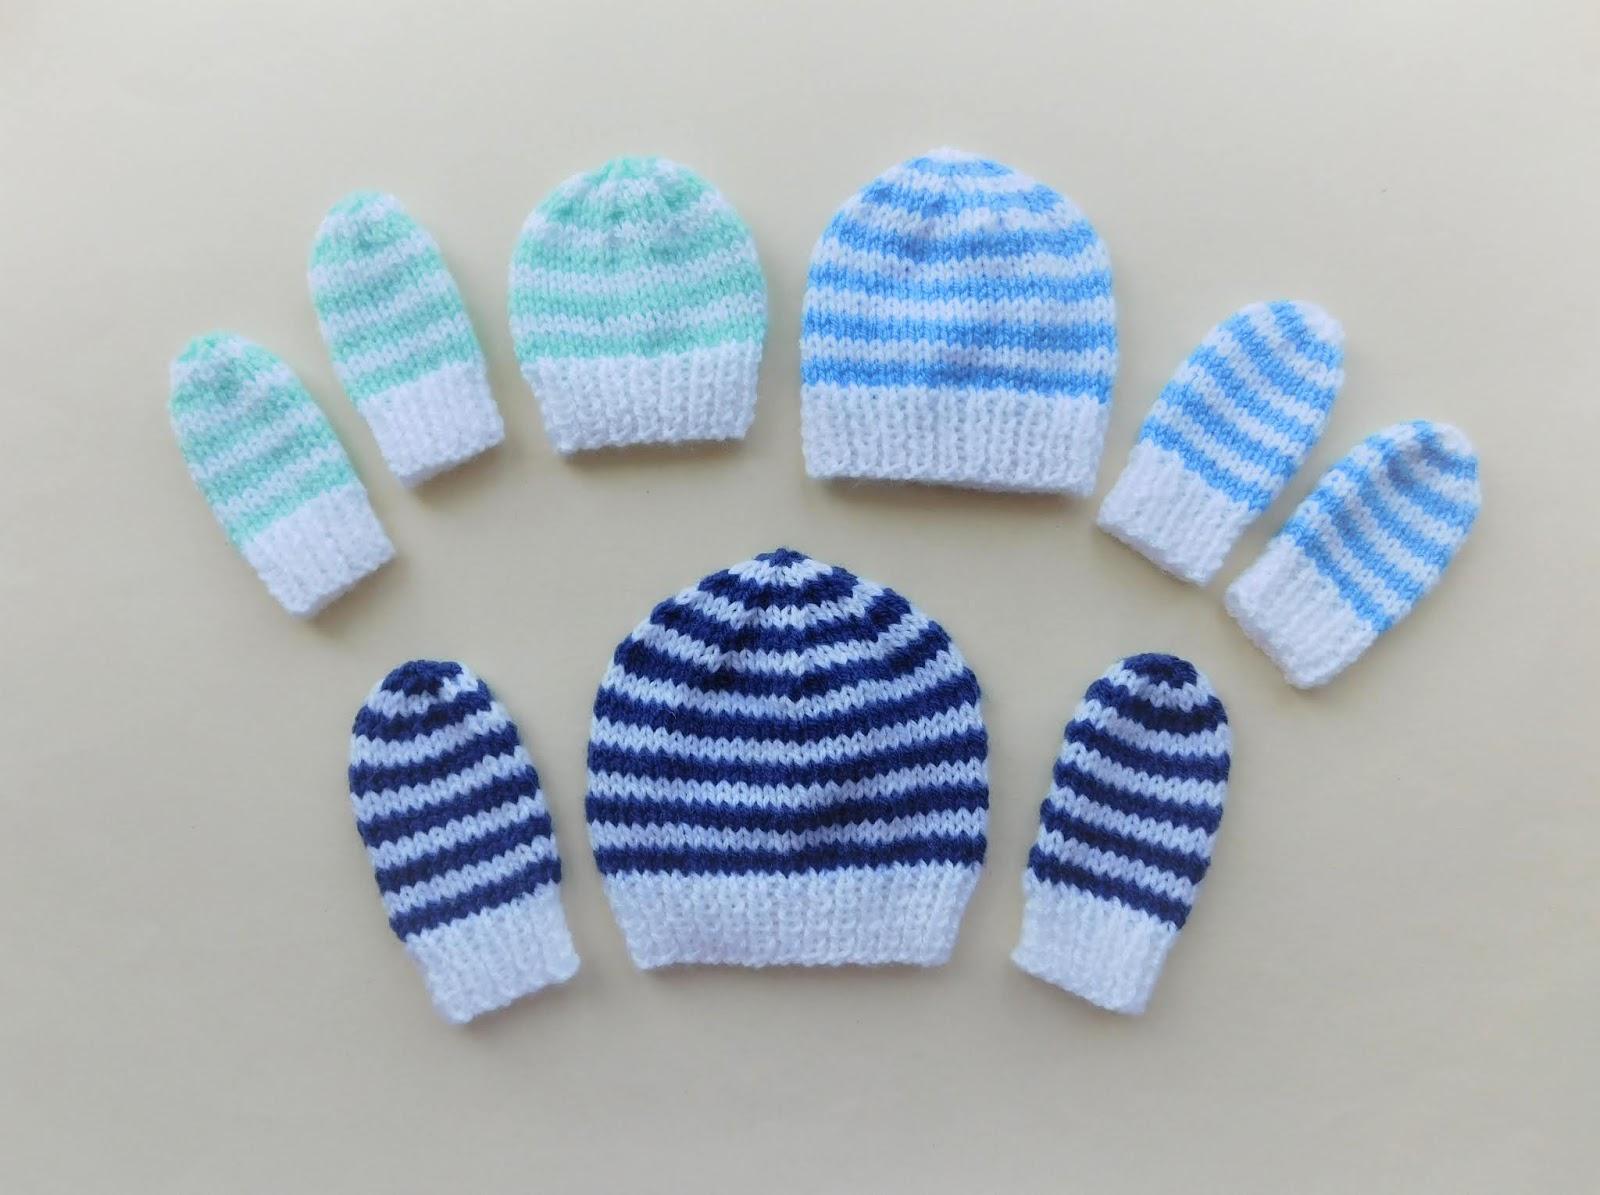 e32285546db17 Marianna s Lazy Daisy Days  Simple Stripes ~ Preemie Baby Beanie Hat ...